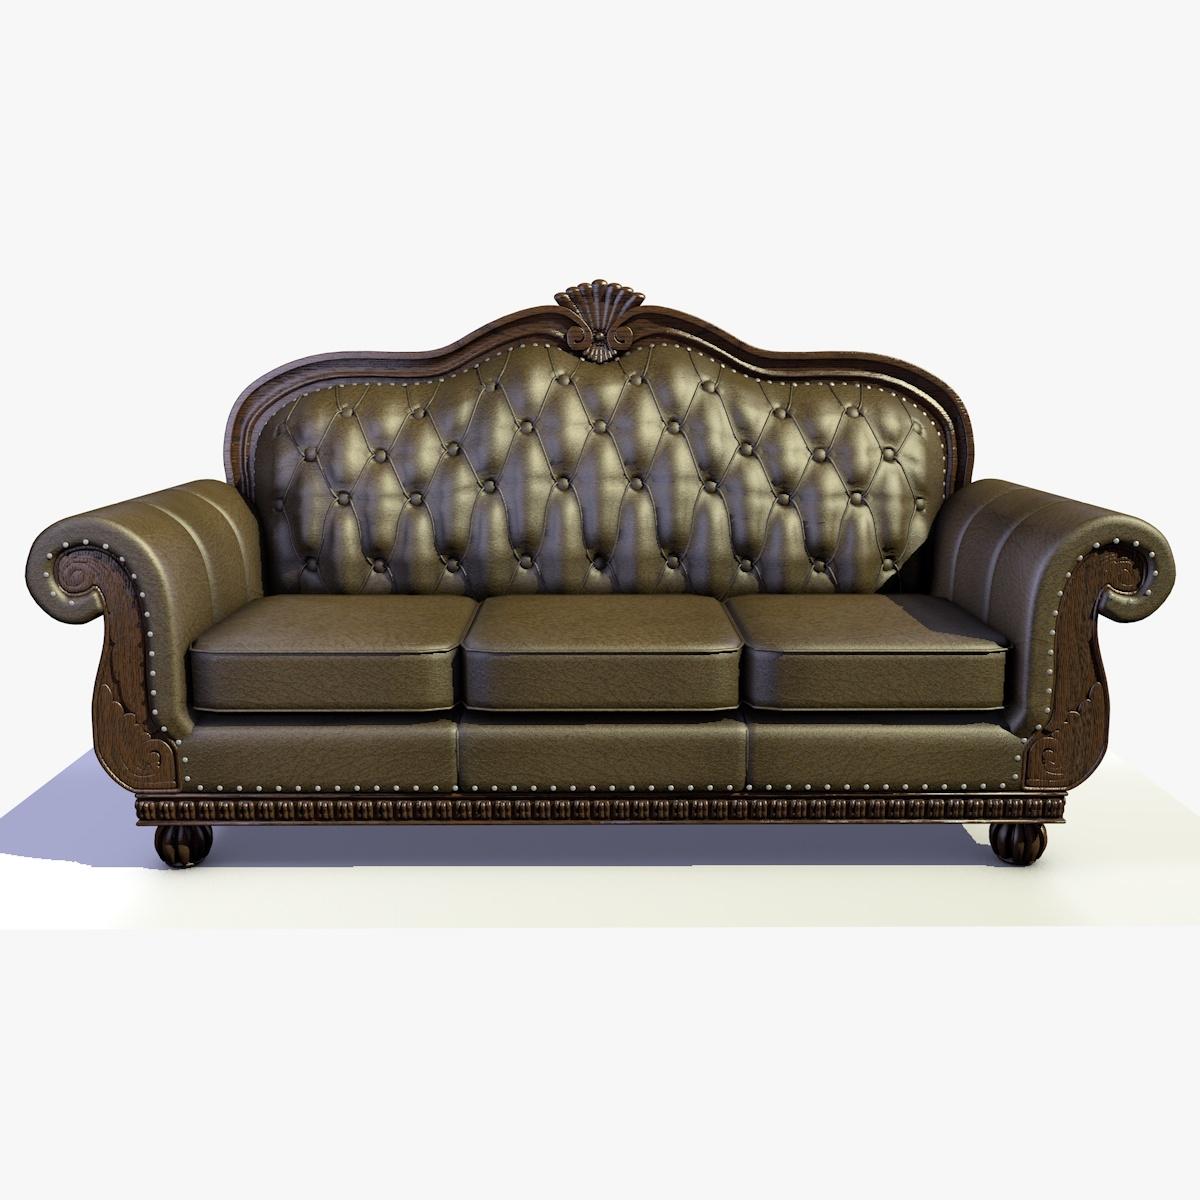 Traditionelles Chesterfield-Sofa aus Massivholz, Leder und Stoff 2